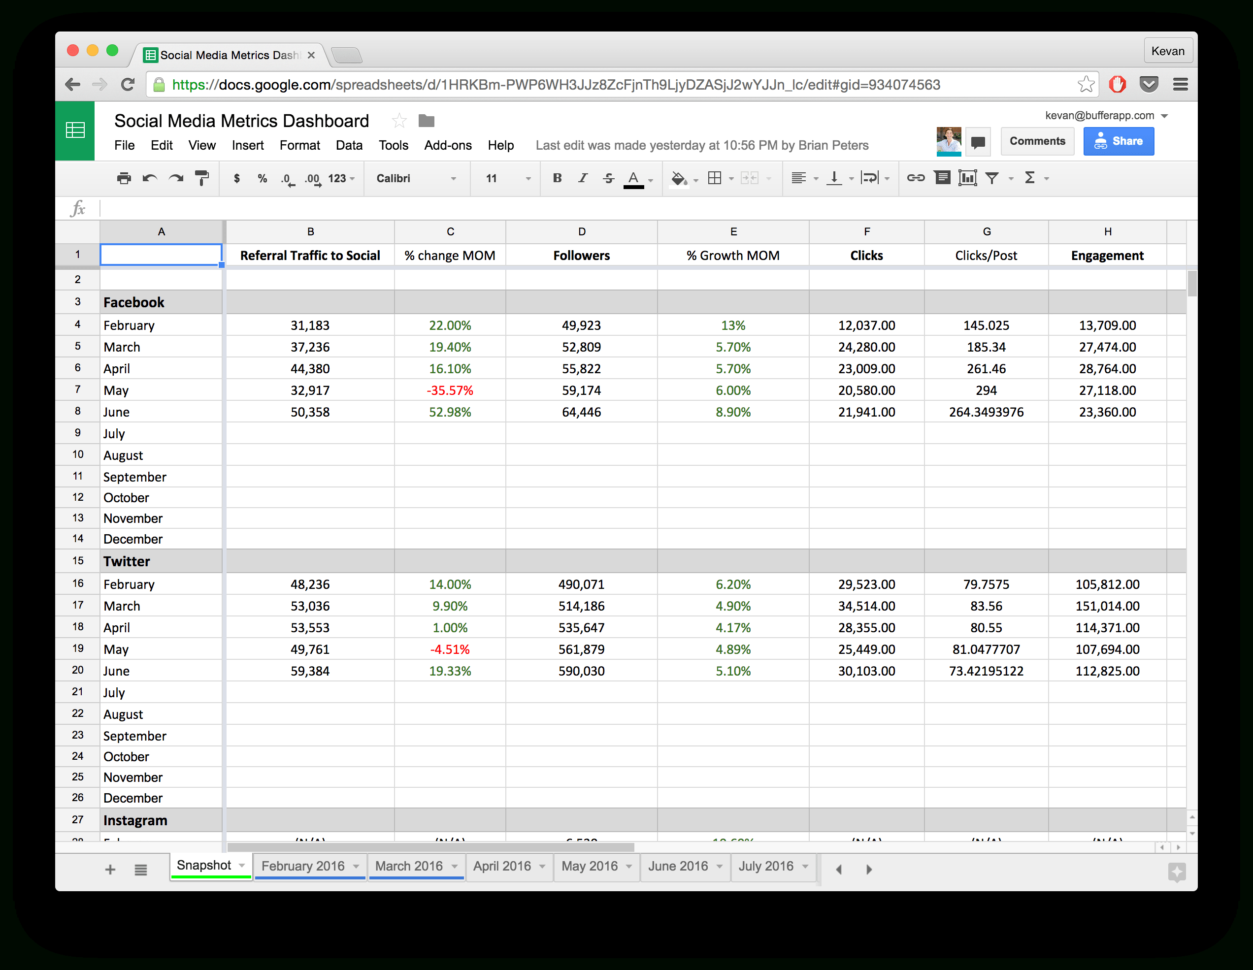 Social Media Metrics Spreadsheet For 10 Readytogo Marketing Spreadsheets To Boost Your Productivity Today